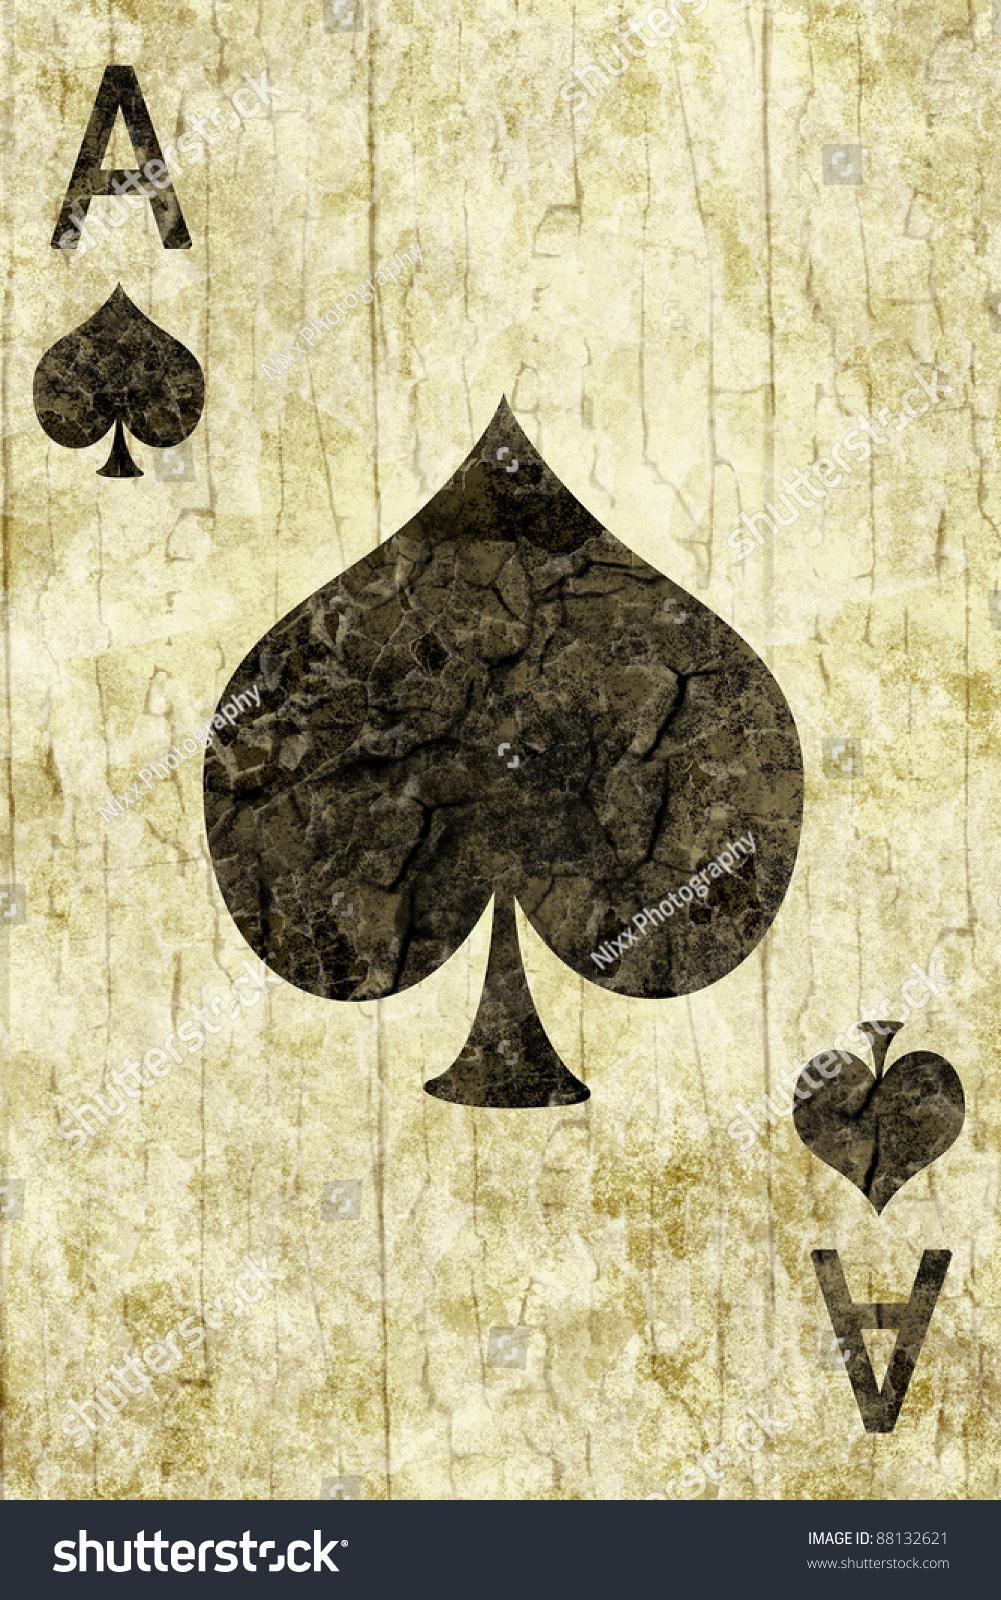 Ace of spades i suck toes ft goddess grazi blu gem cierarogers dazzledfeet - 2 7